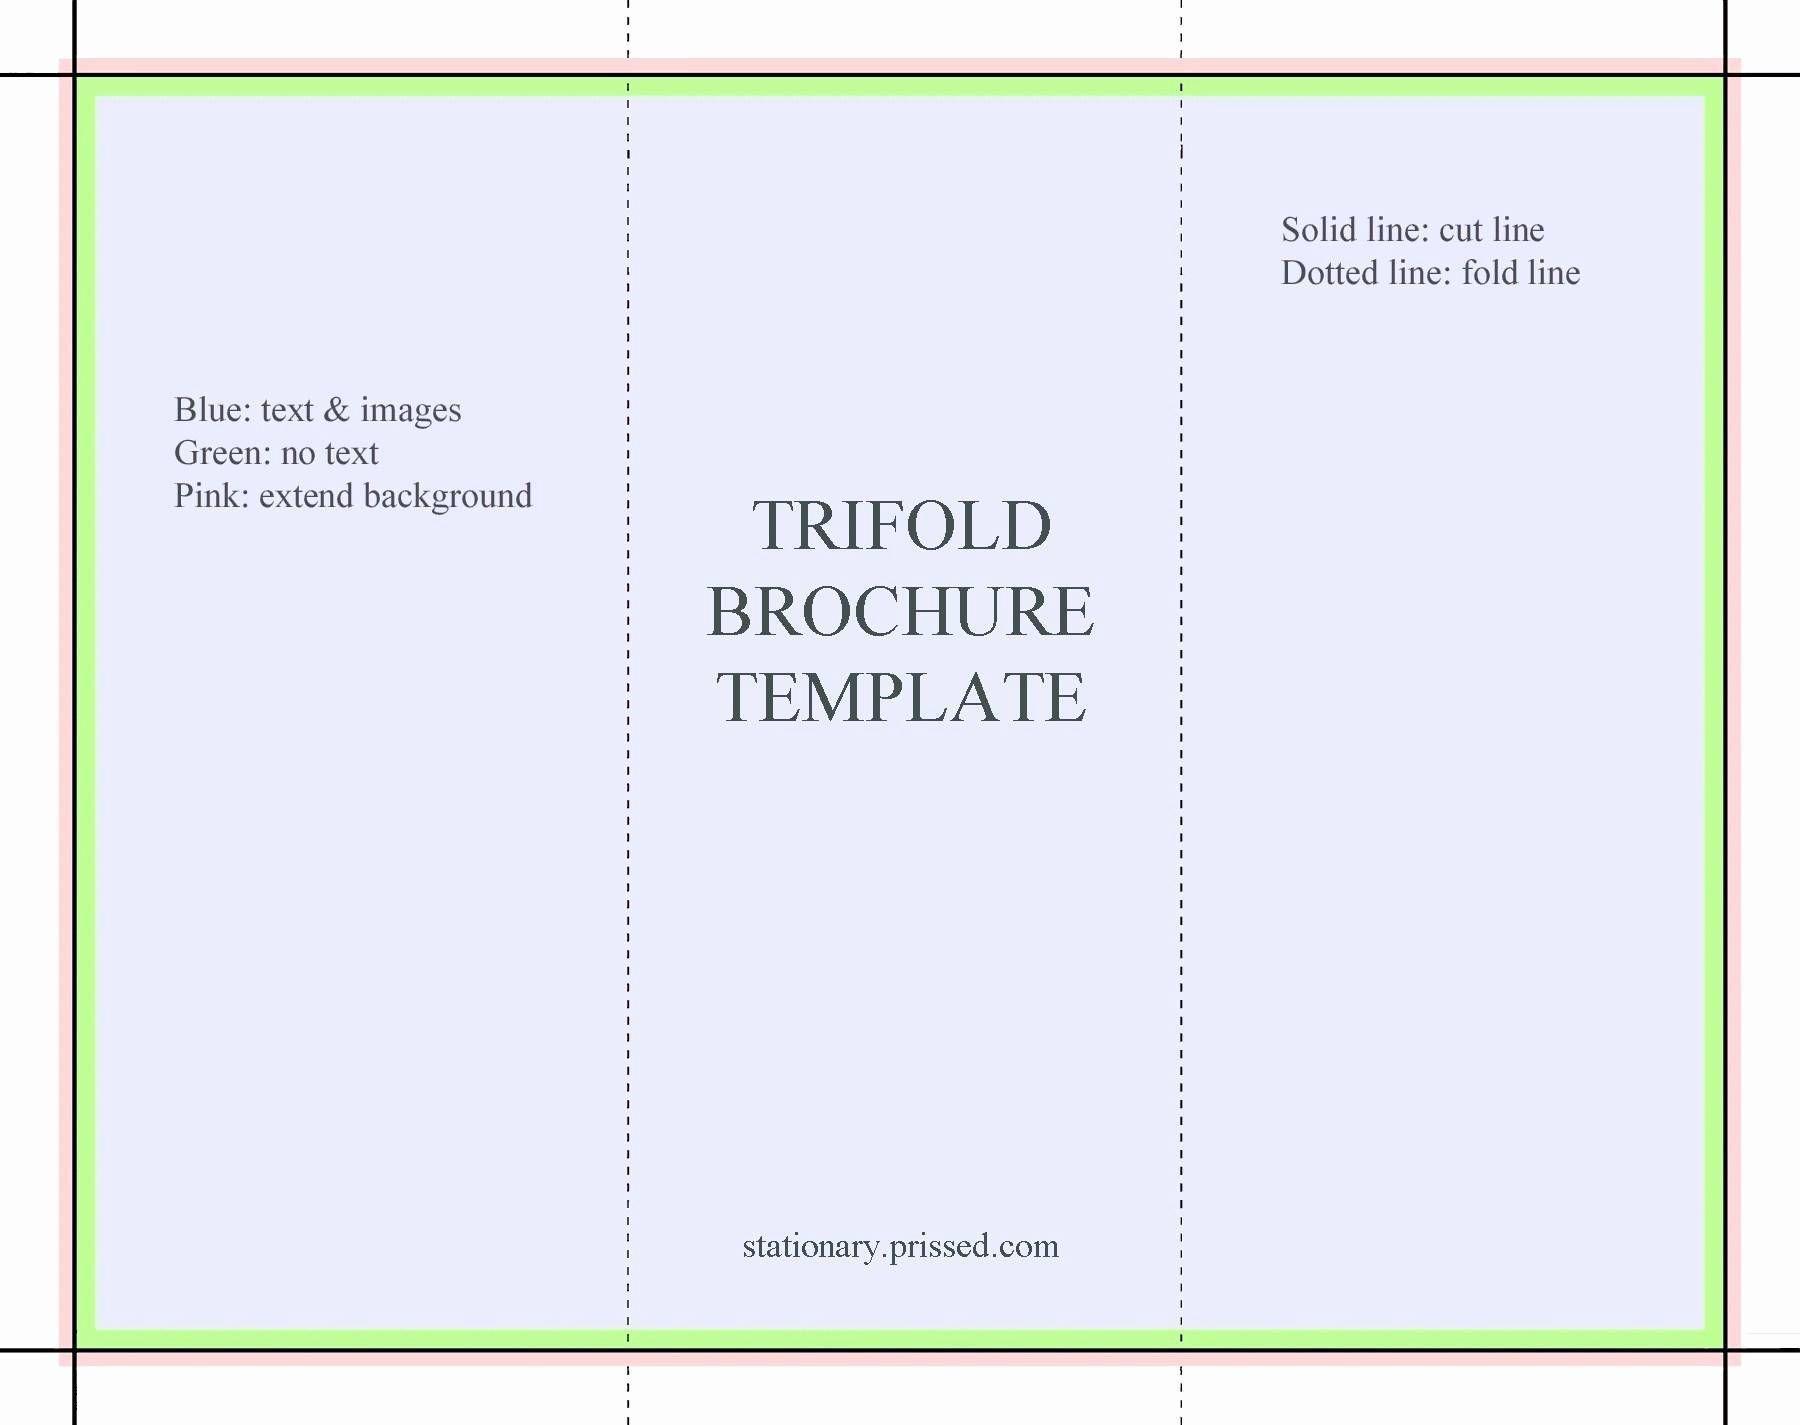 000 Unusual Brochure Template For Google Doc High Definition  Docs Free 3 Panel Tri FoldFull